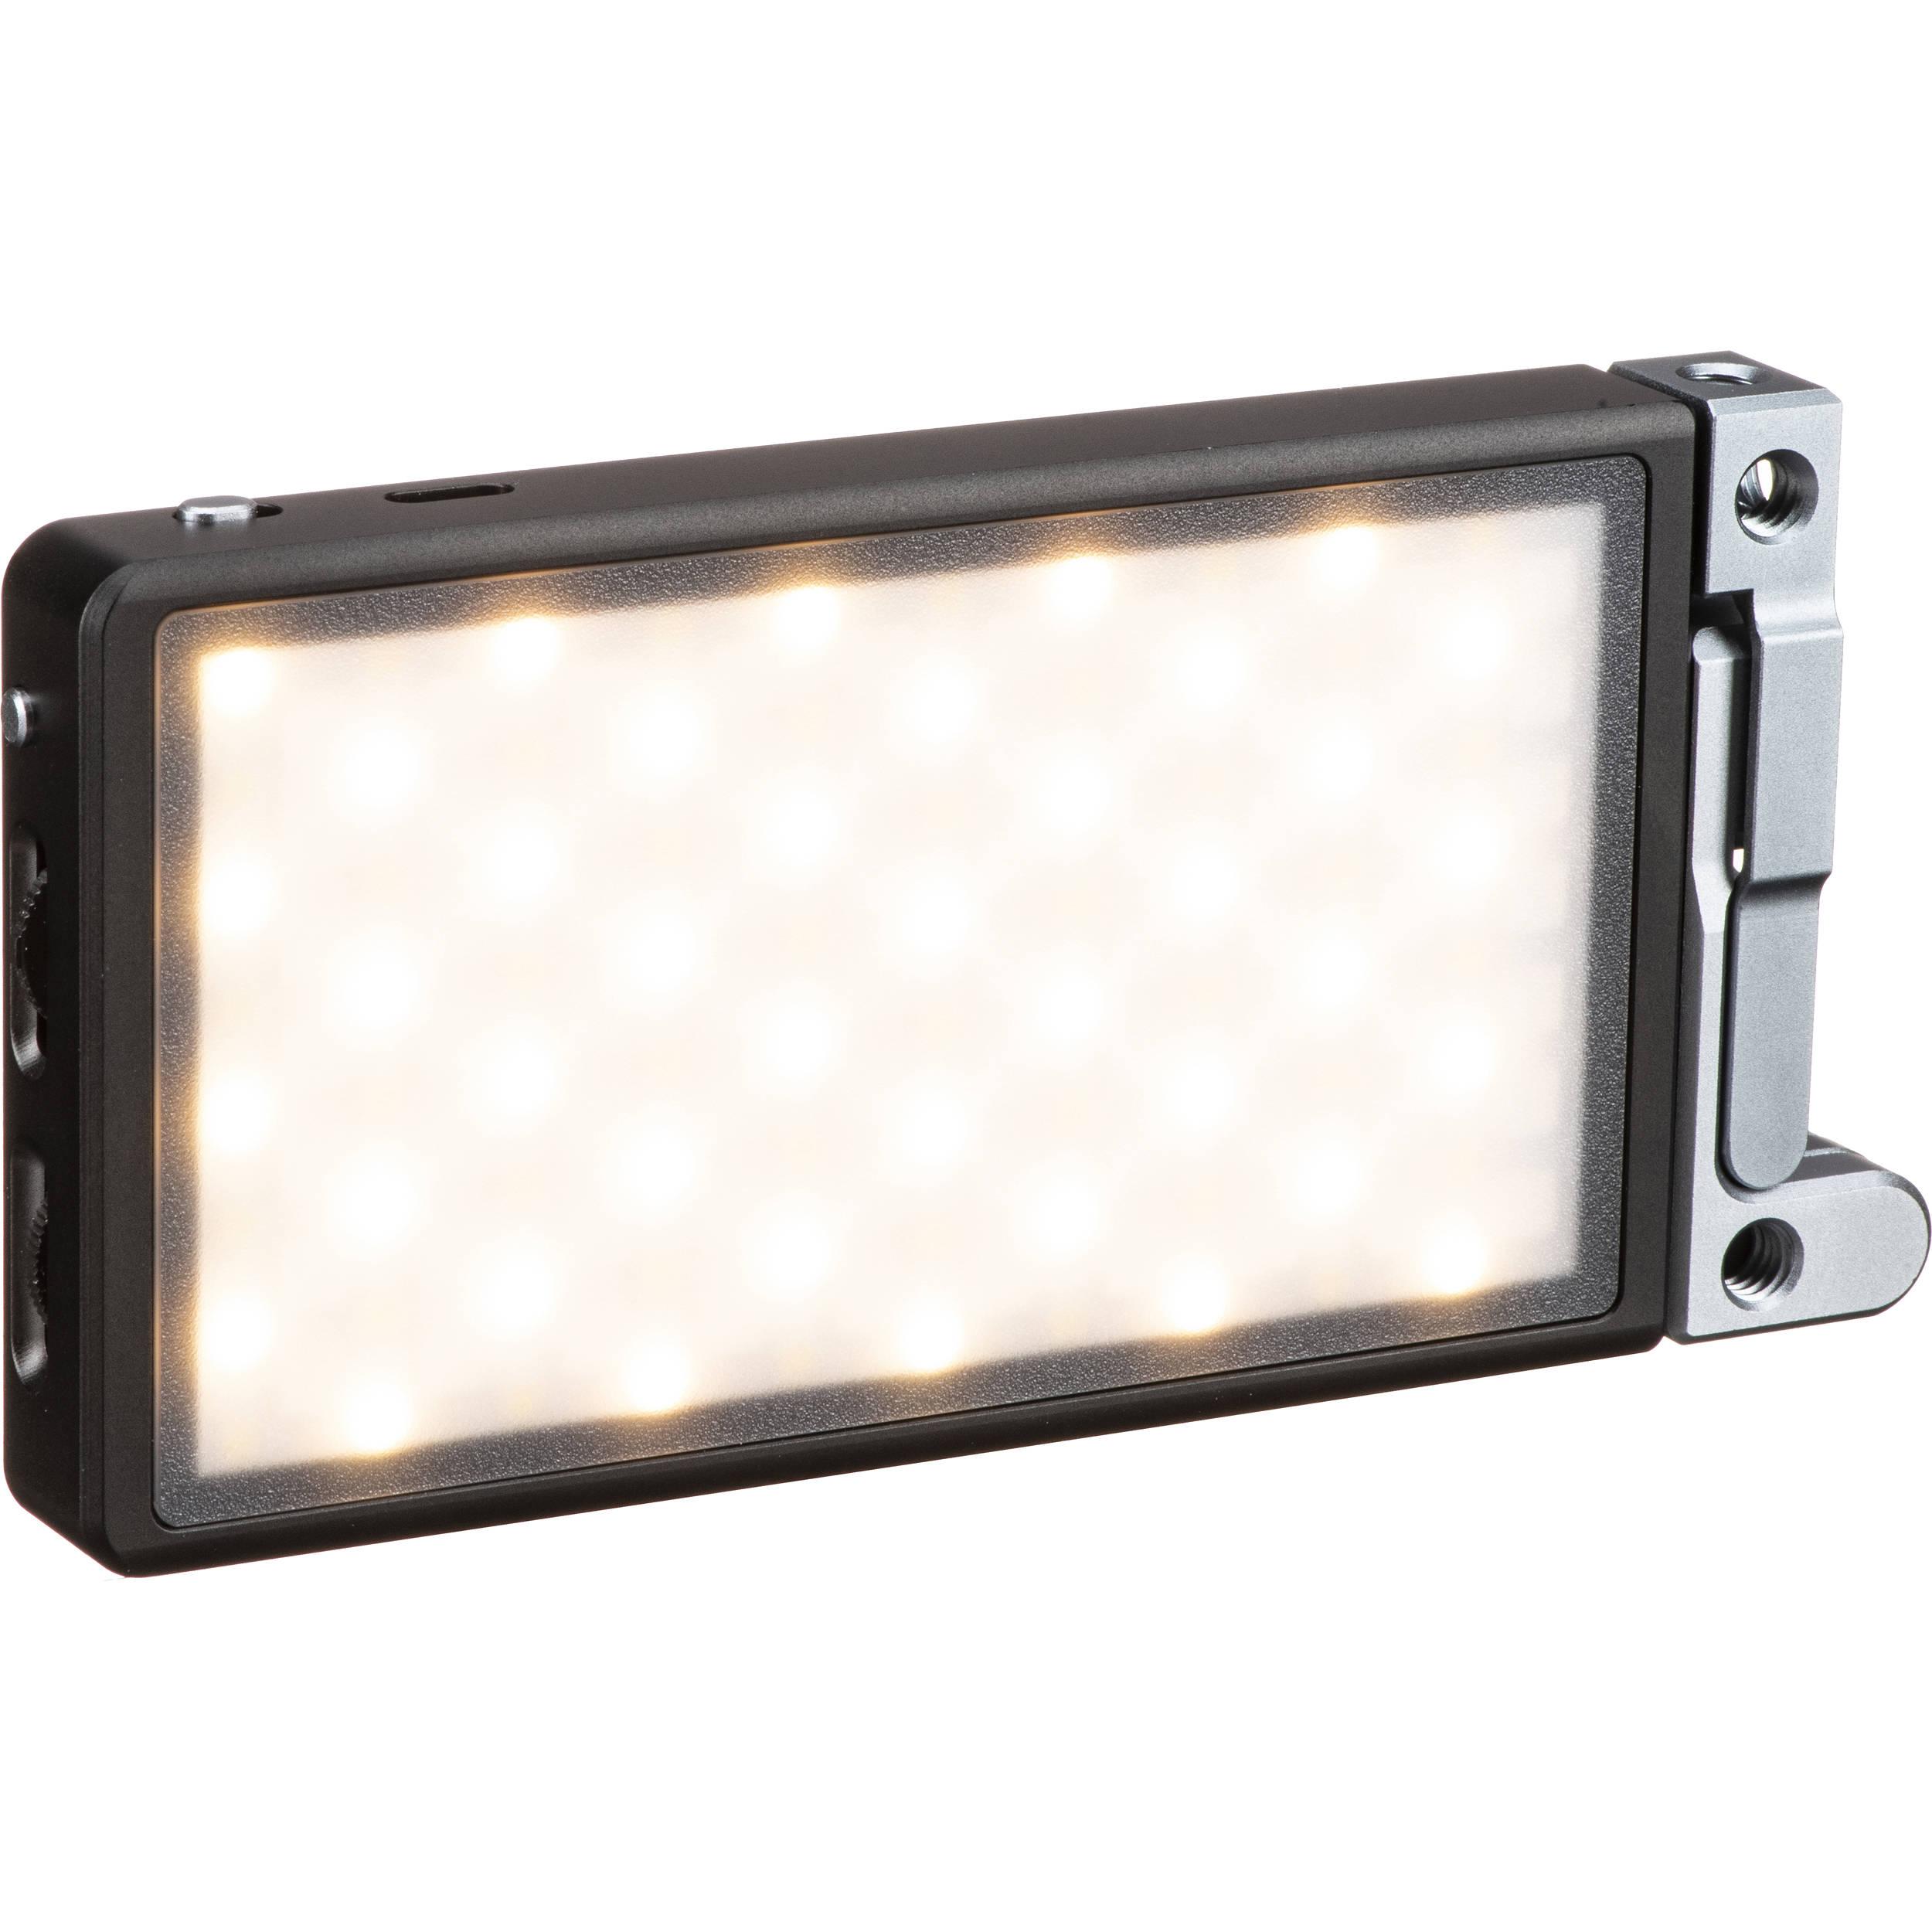 Boling BL-P1 Lumi Master Package Kit Honeycomb Grid Soft Box Diffuser for Boling BL-P1 RGB Light